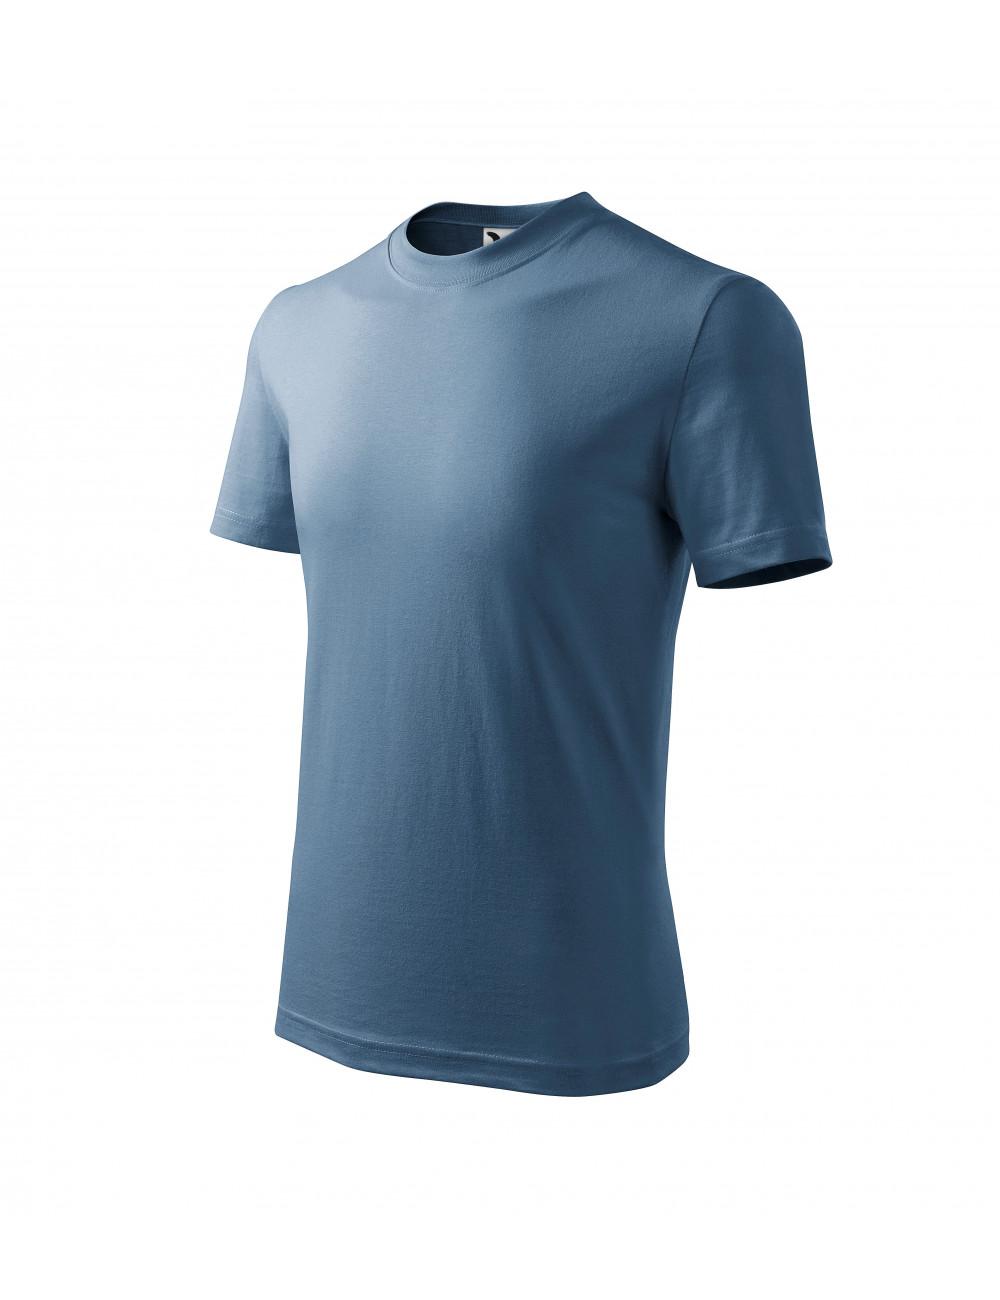 Adler MALFINI Koszulka dziecięca Basic 138 denim